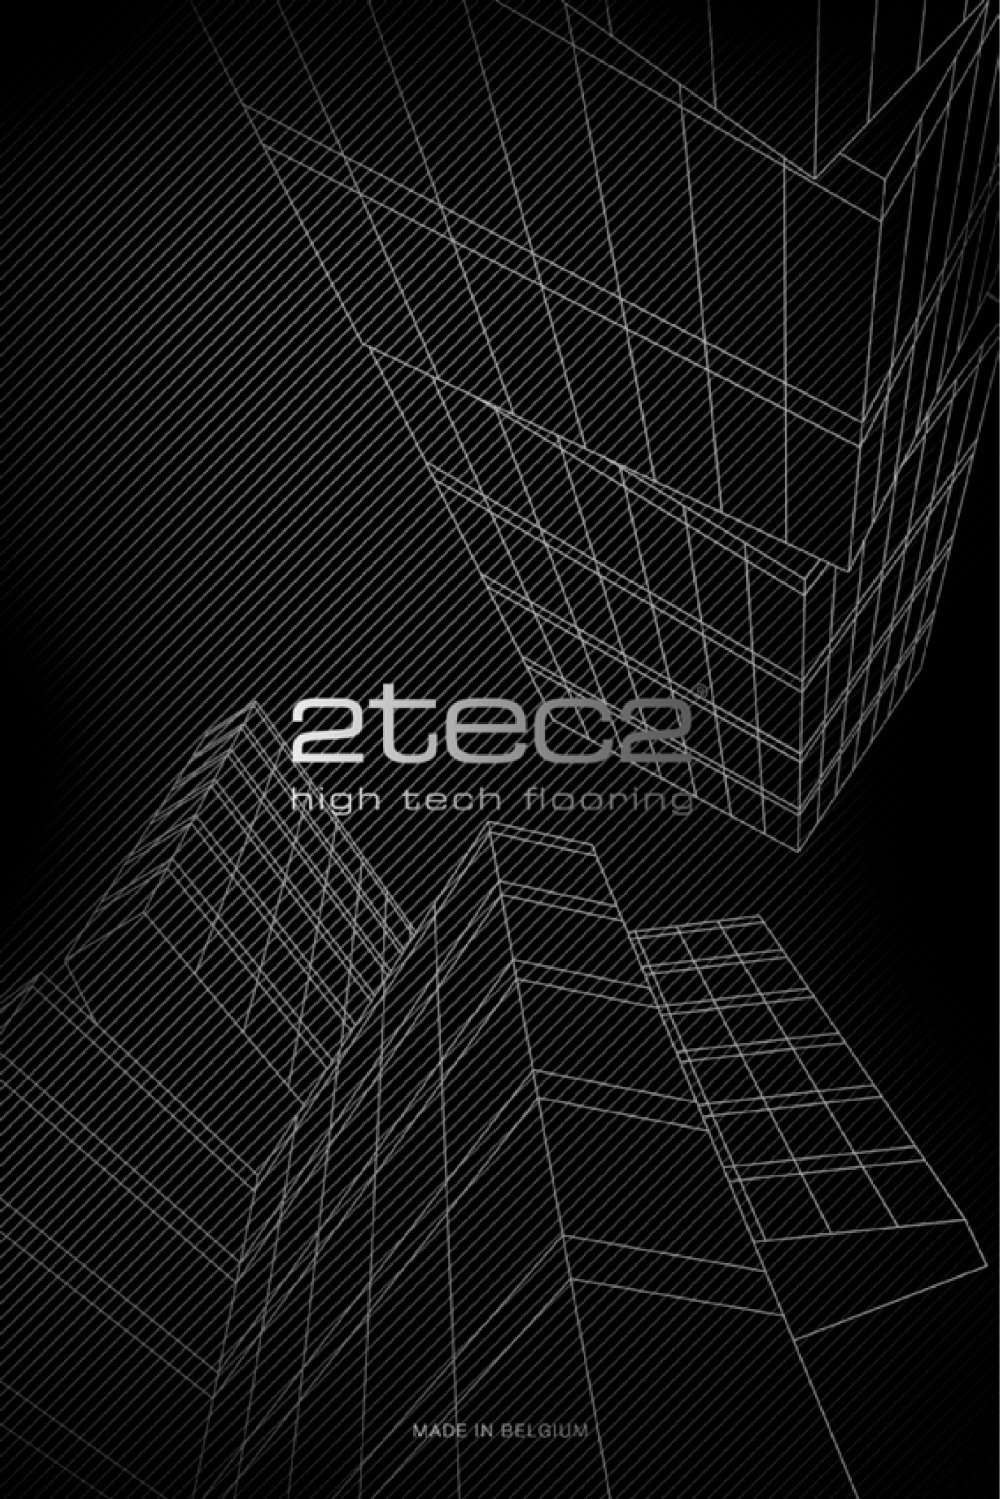 2tec2 High Tech Flooring 2tec2 Pdf Catalogs Documentation